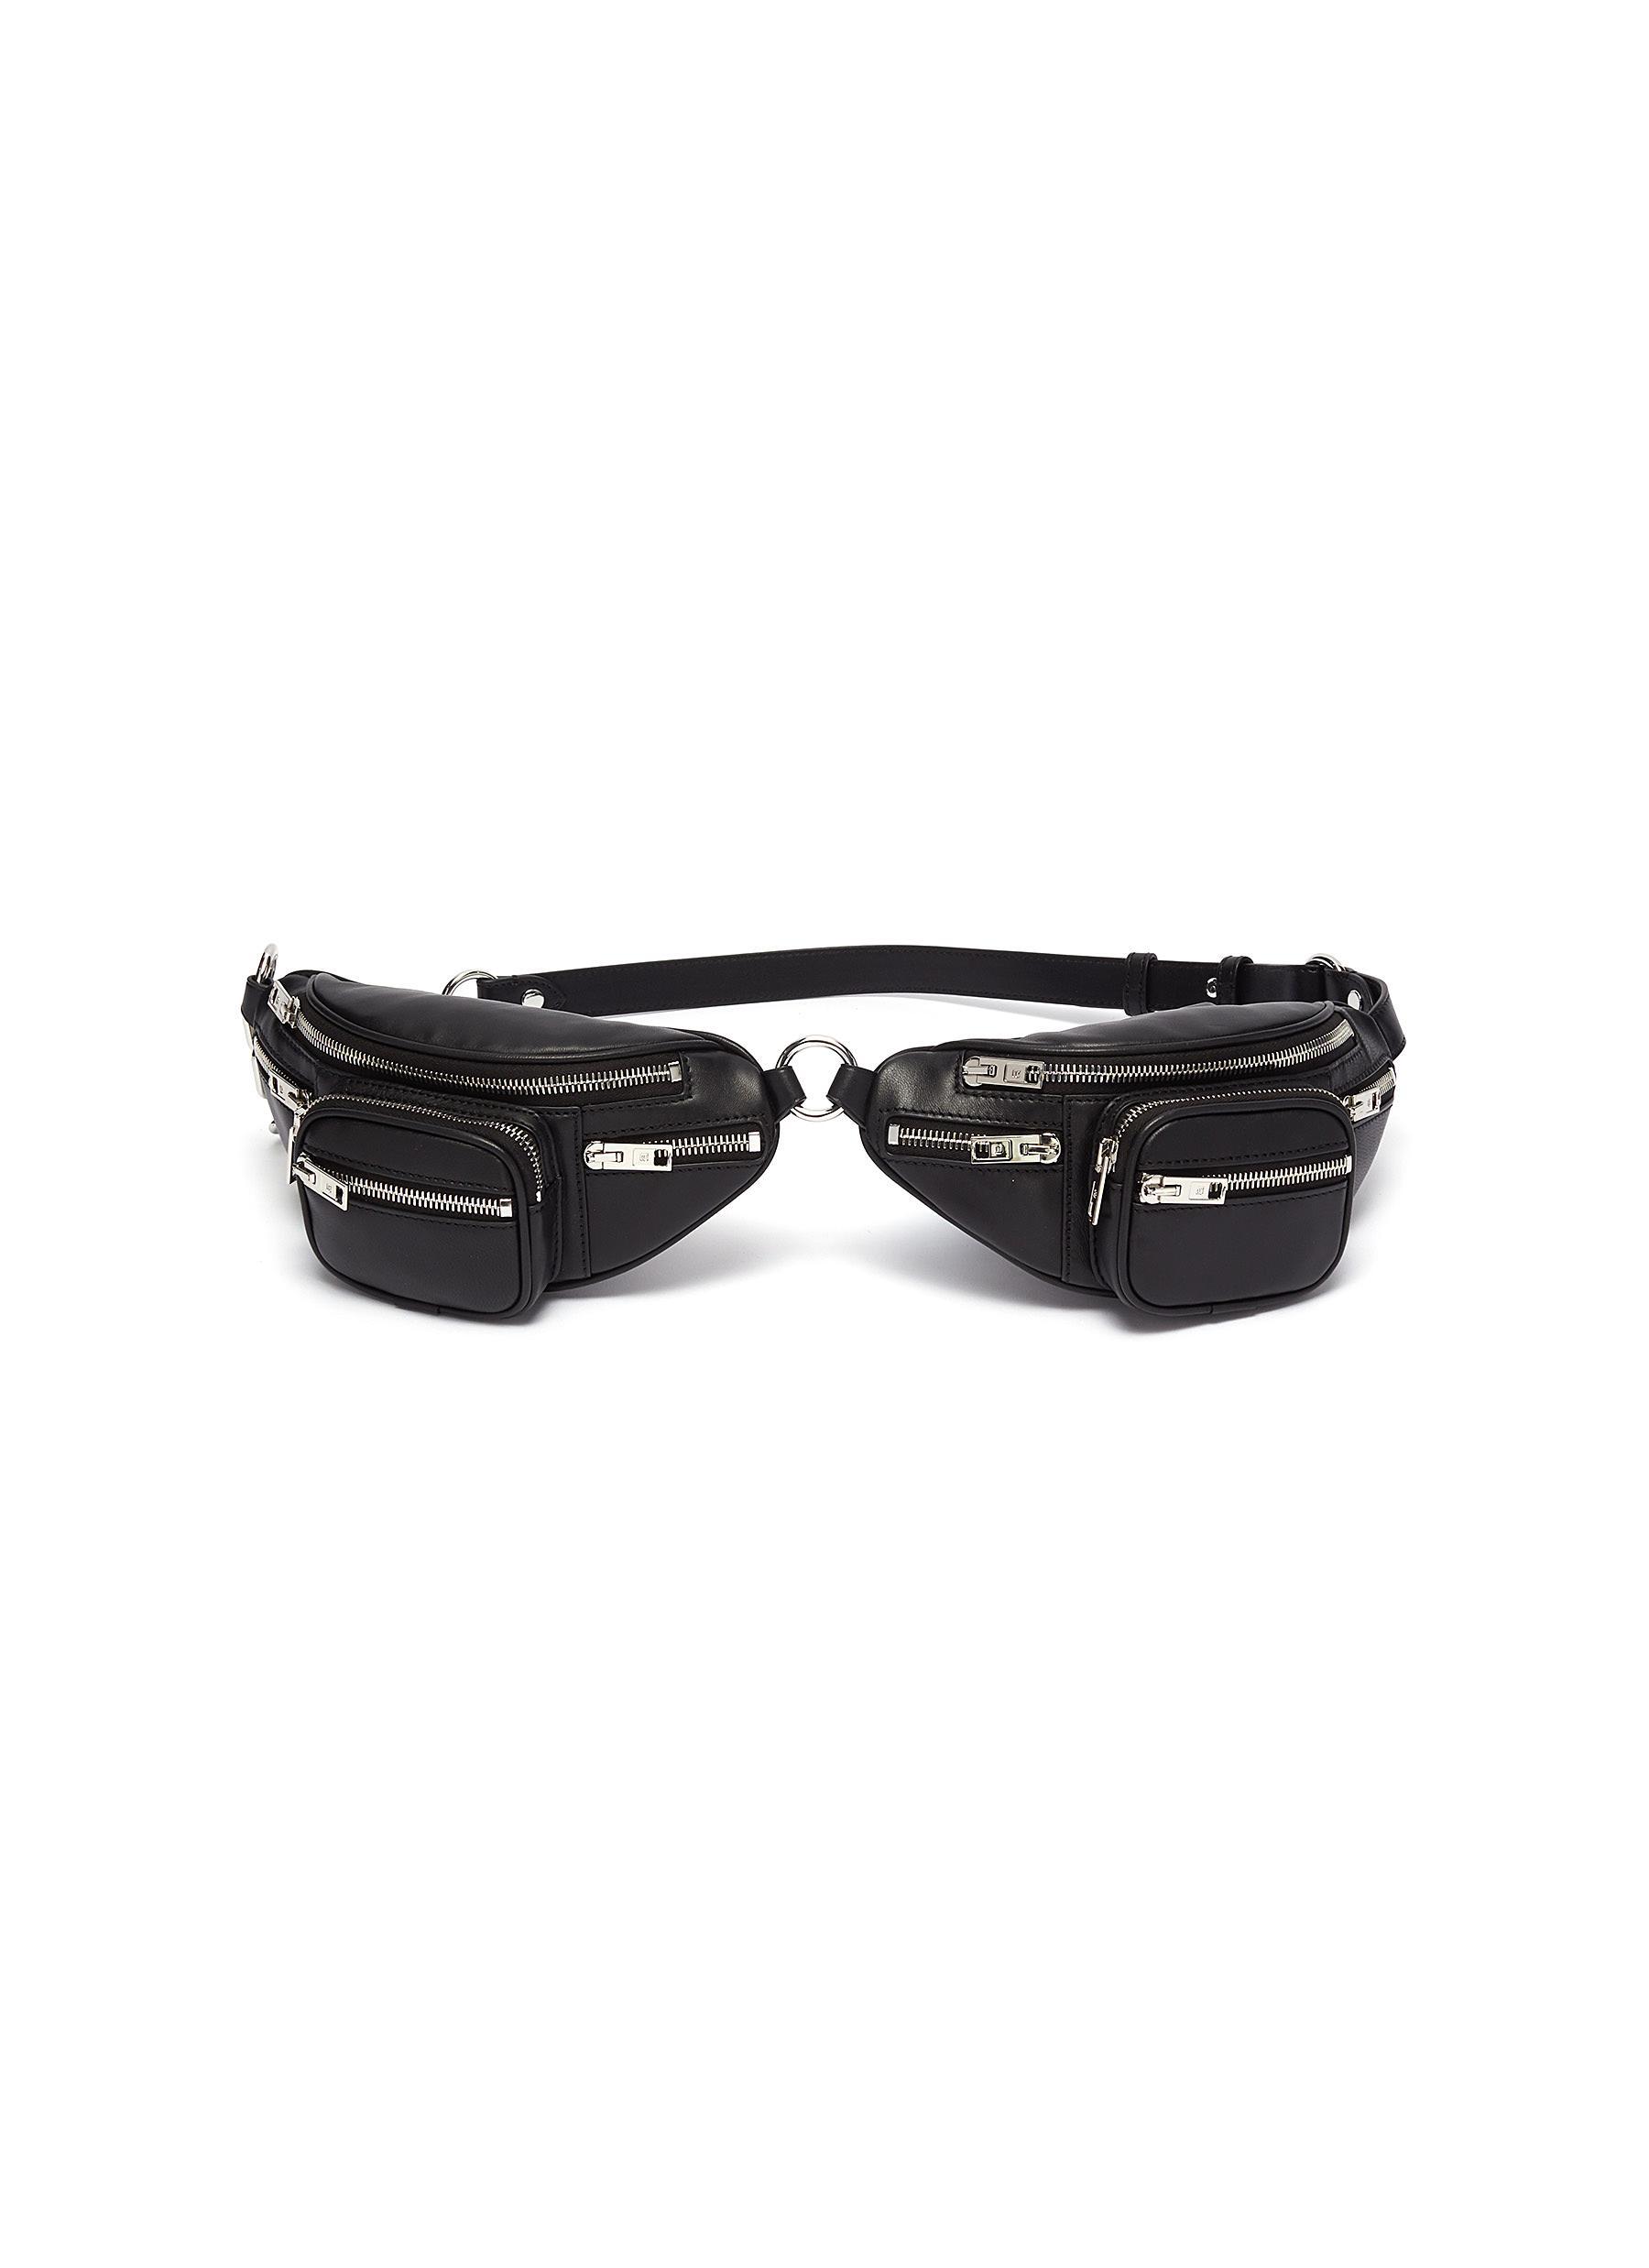 Alexander Wang 'Attica' double leather mini belt bag